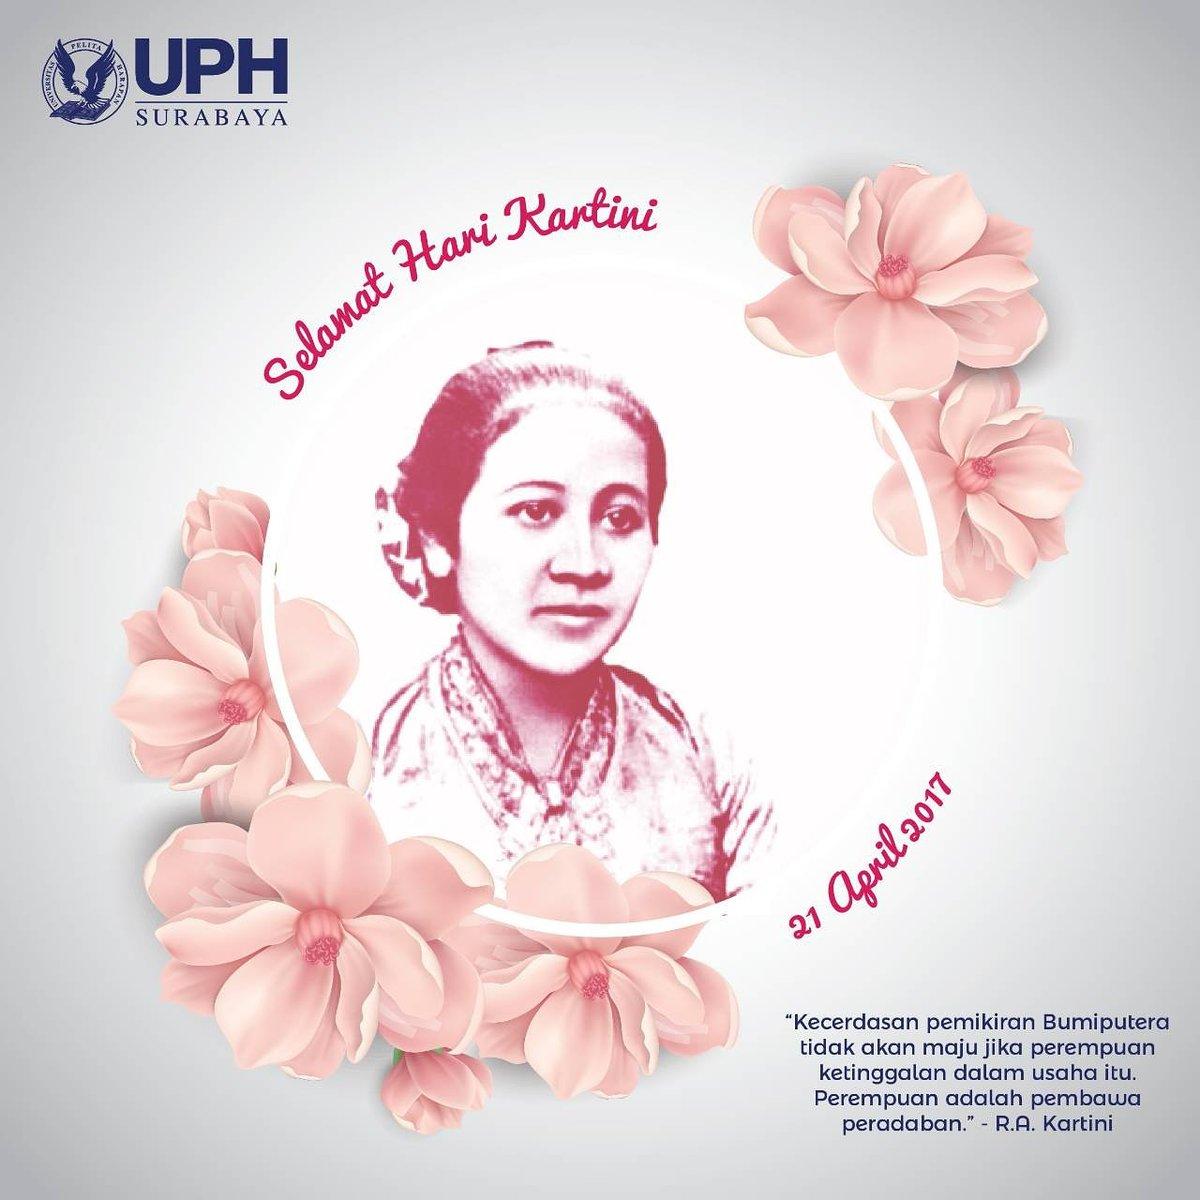 SELAMAT HARI KARTINI !! 👩👩👩 #kartini #harikartini #radenajengkartini #emansipasiwanita #21042017 #uph #uphs #uphSurabaya https://t.co/a8faUBUQUg